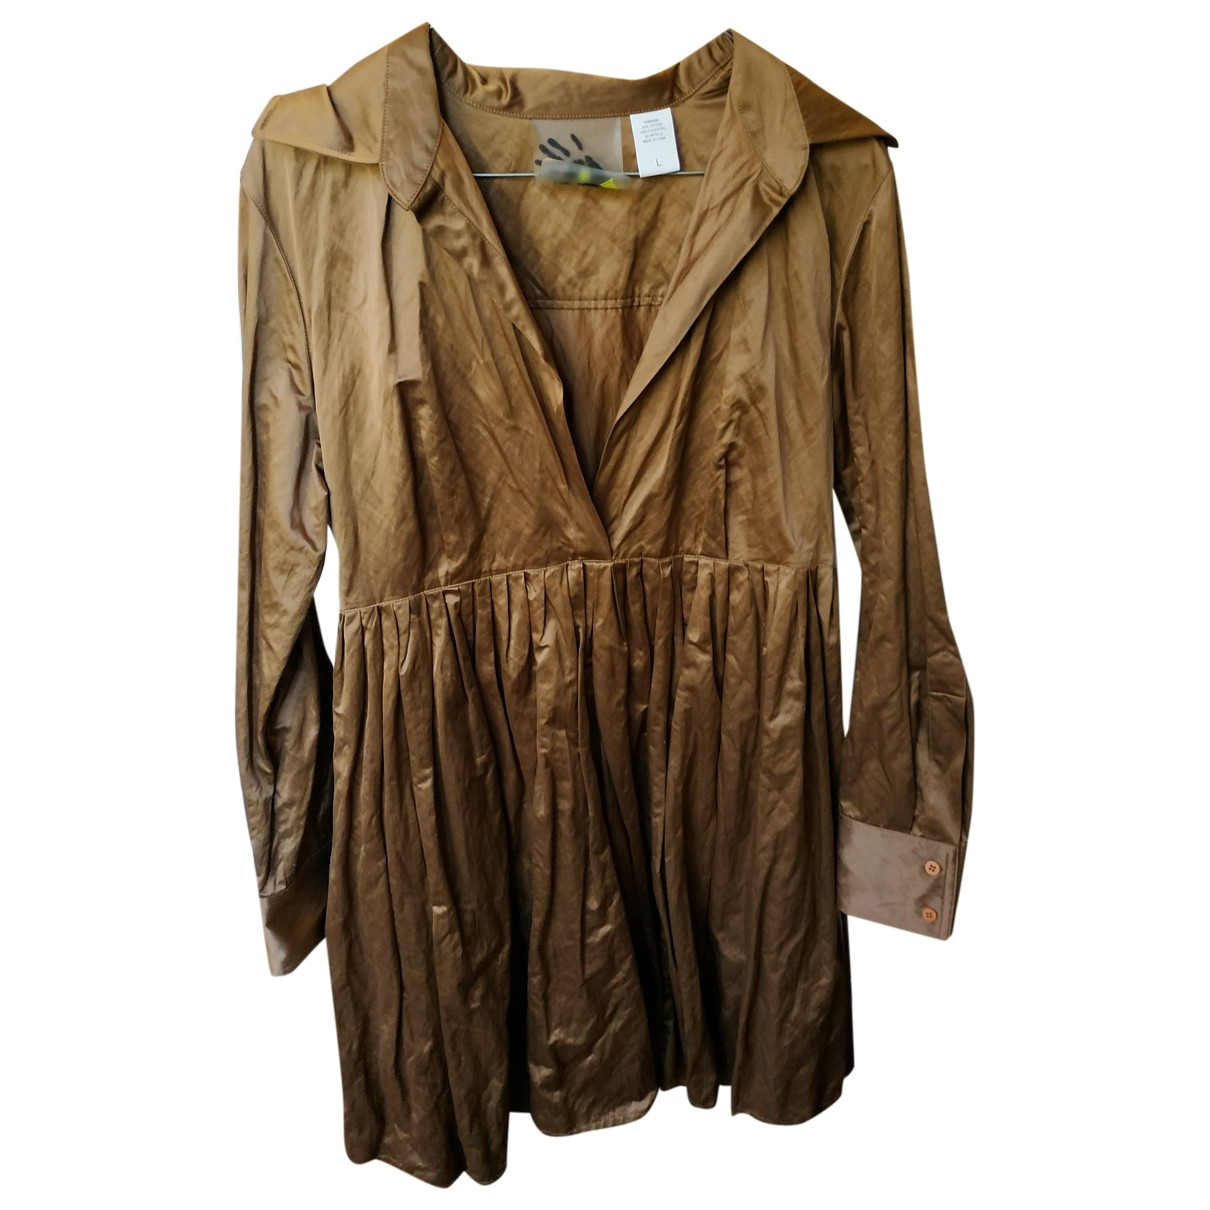 Norma Kamali \N Brown Cotton dress for Women L International